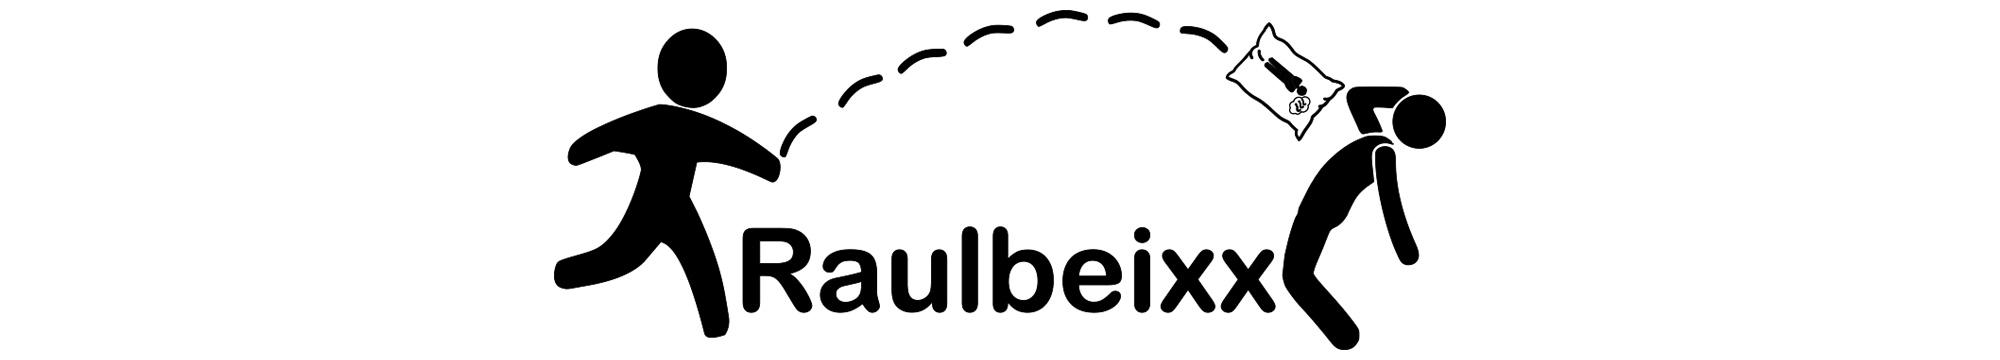 Raulbeixx